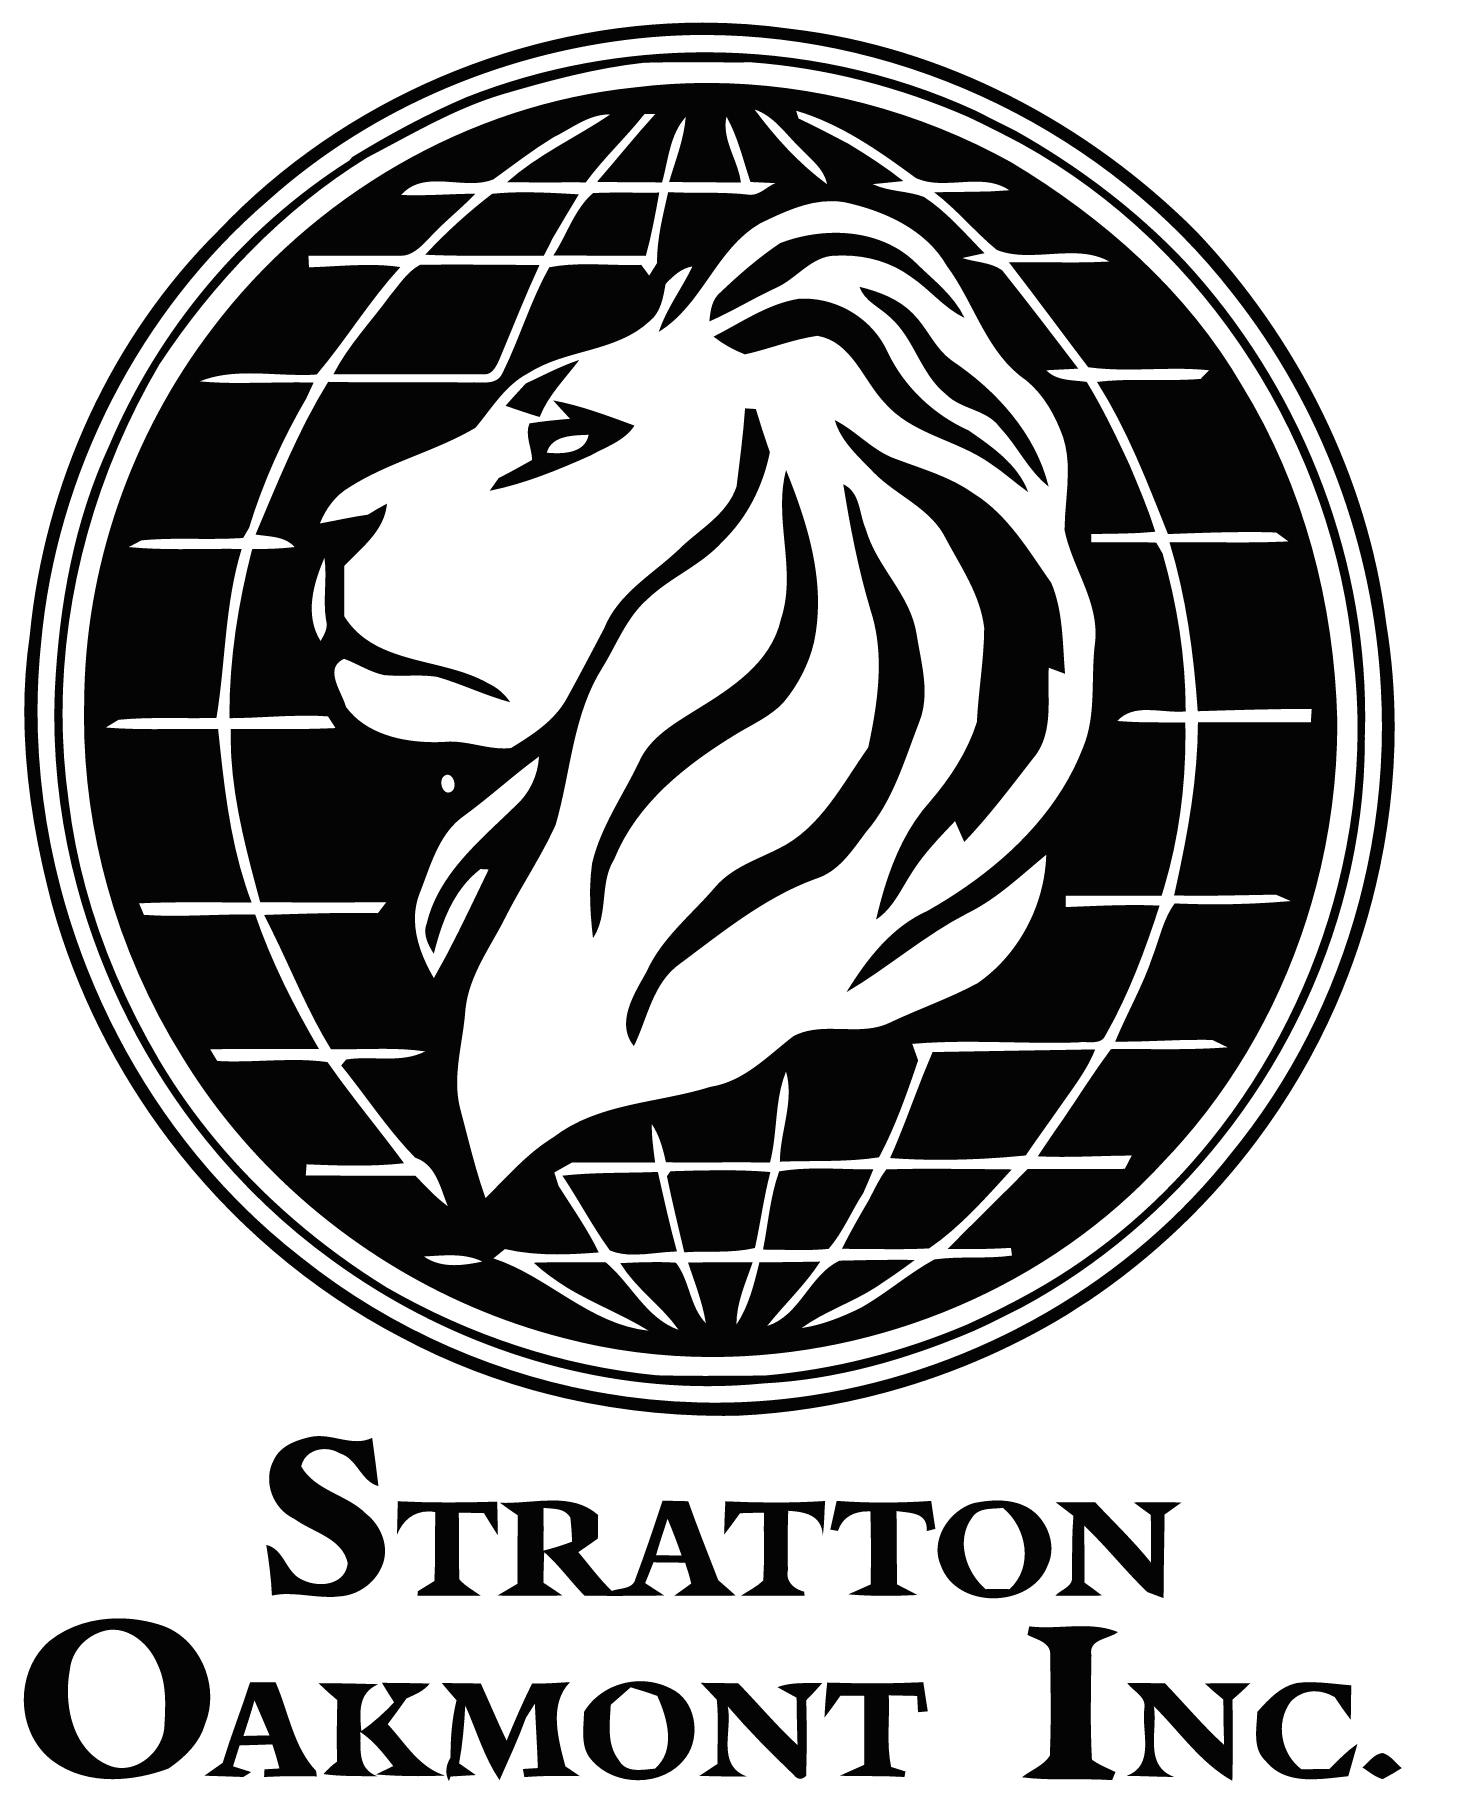 Ougd402 The Wolf Of Wall Street Stratton Oakmont Inc Logo